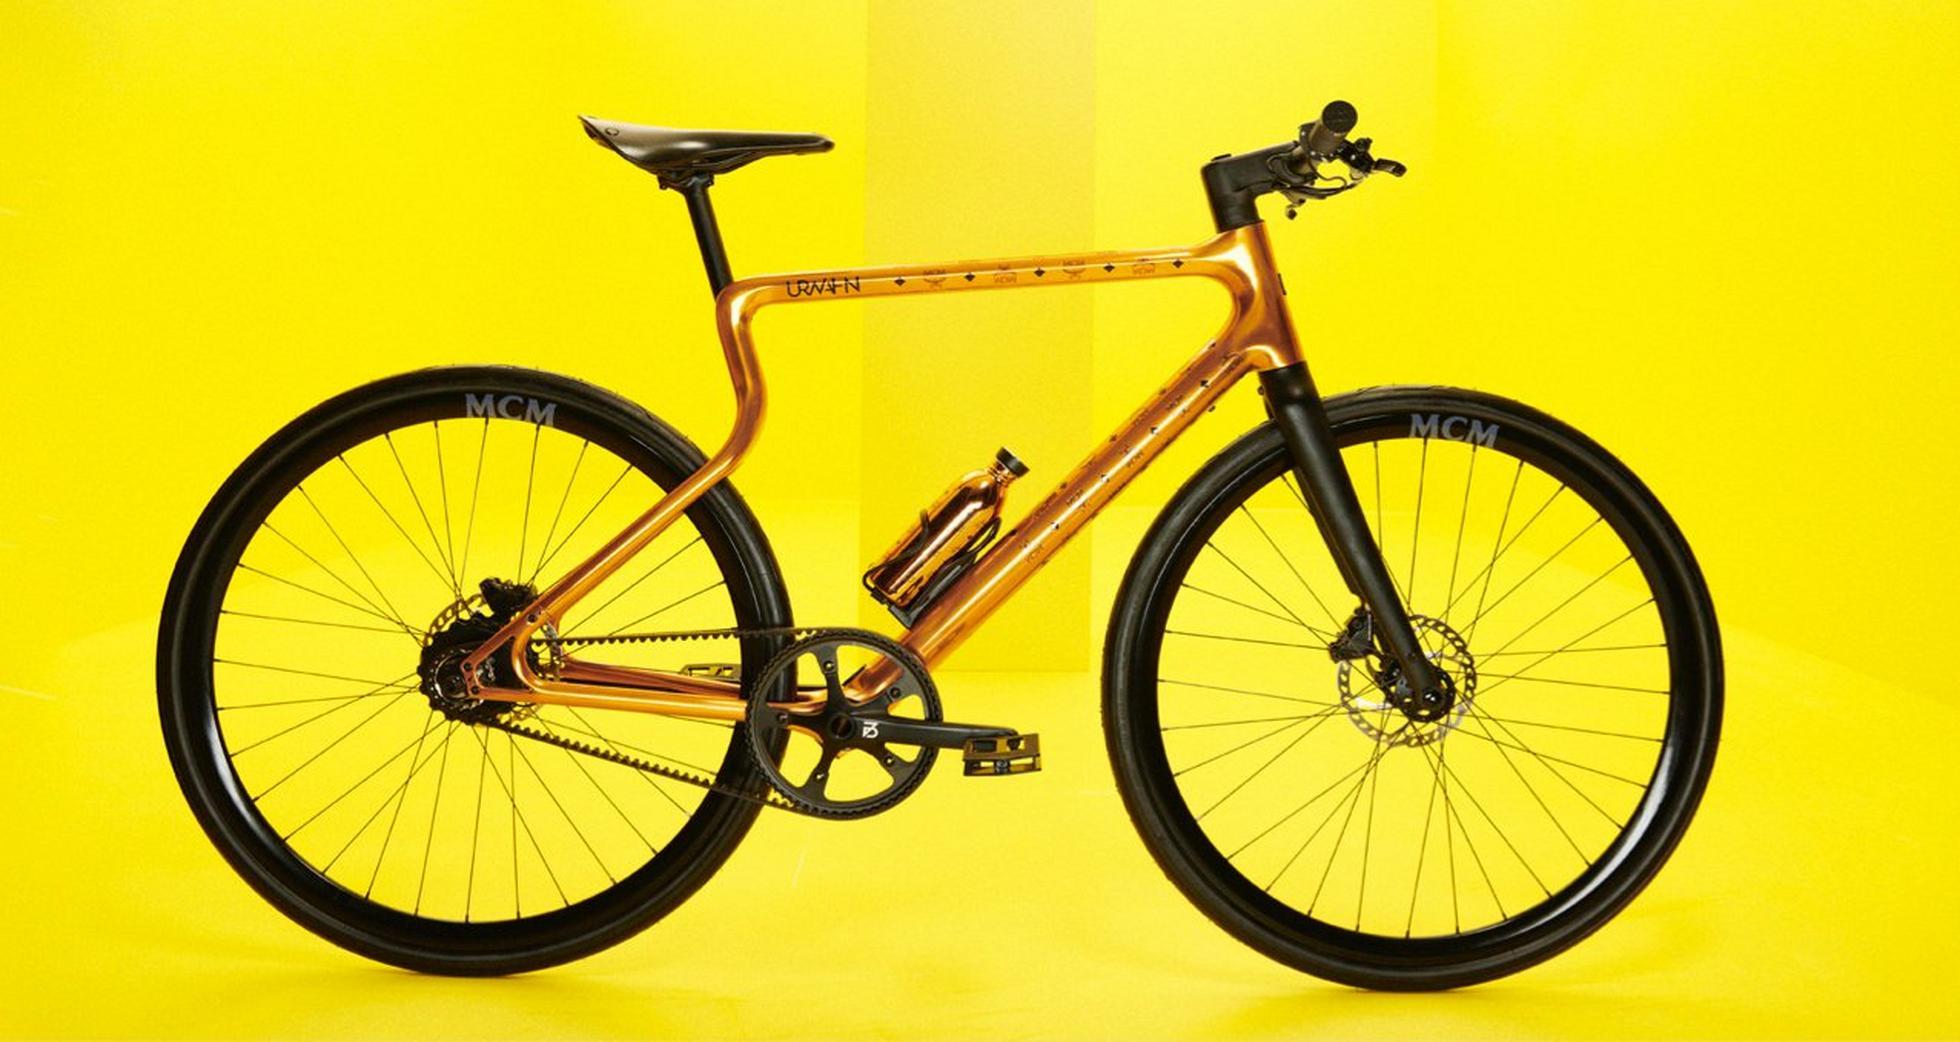 MCM x URWAHN E-Bike